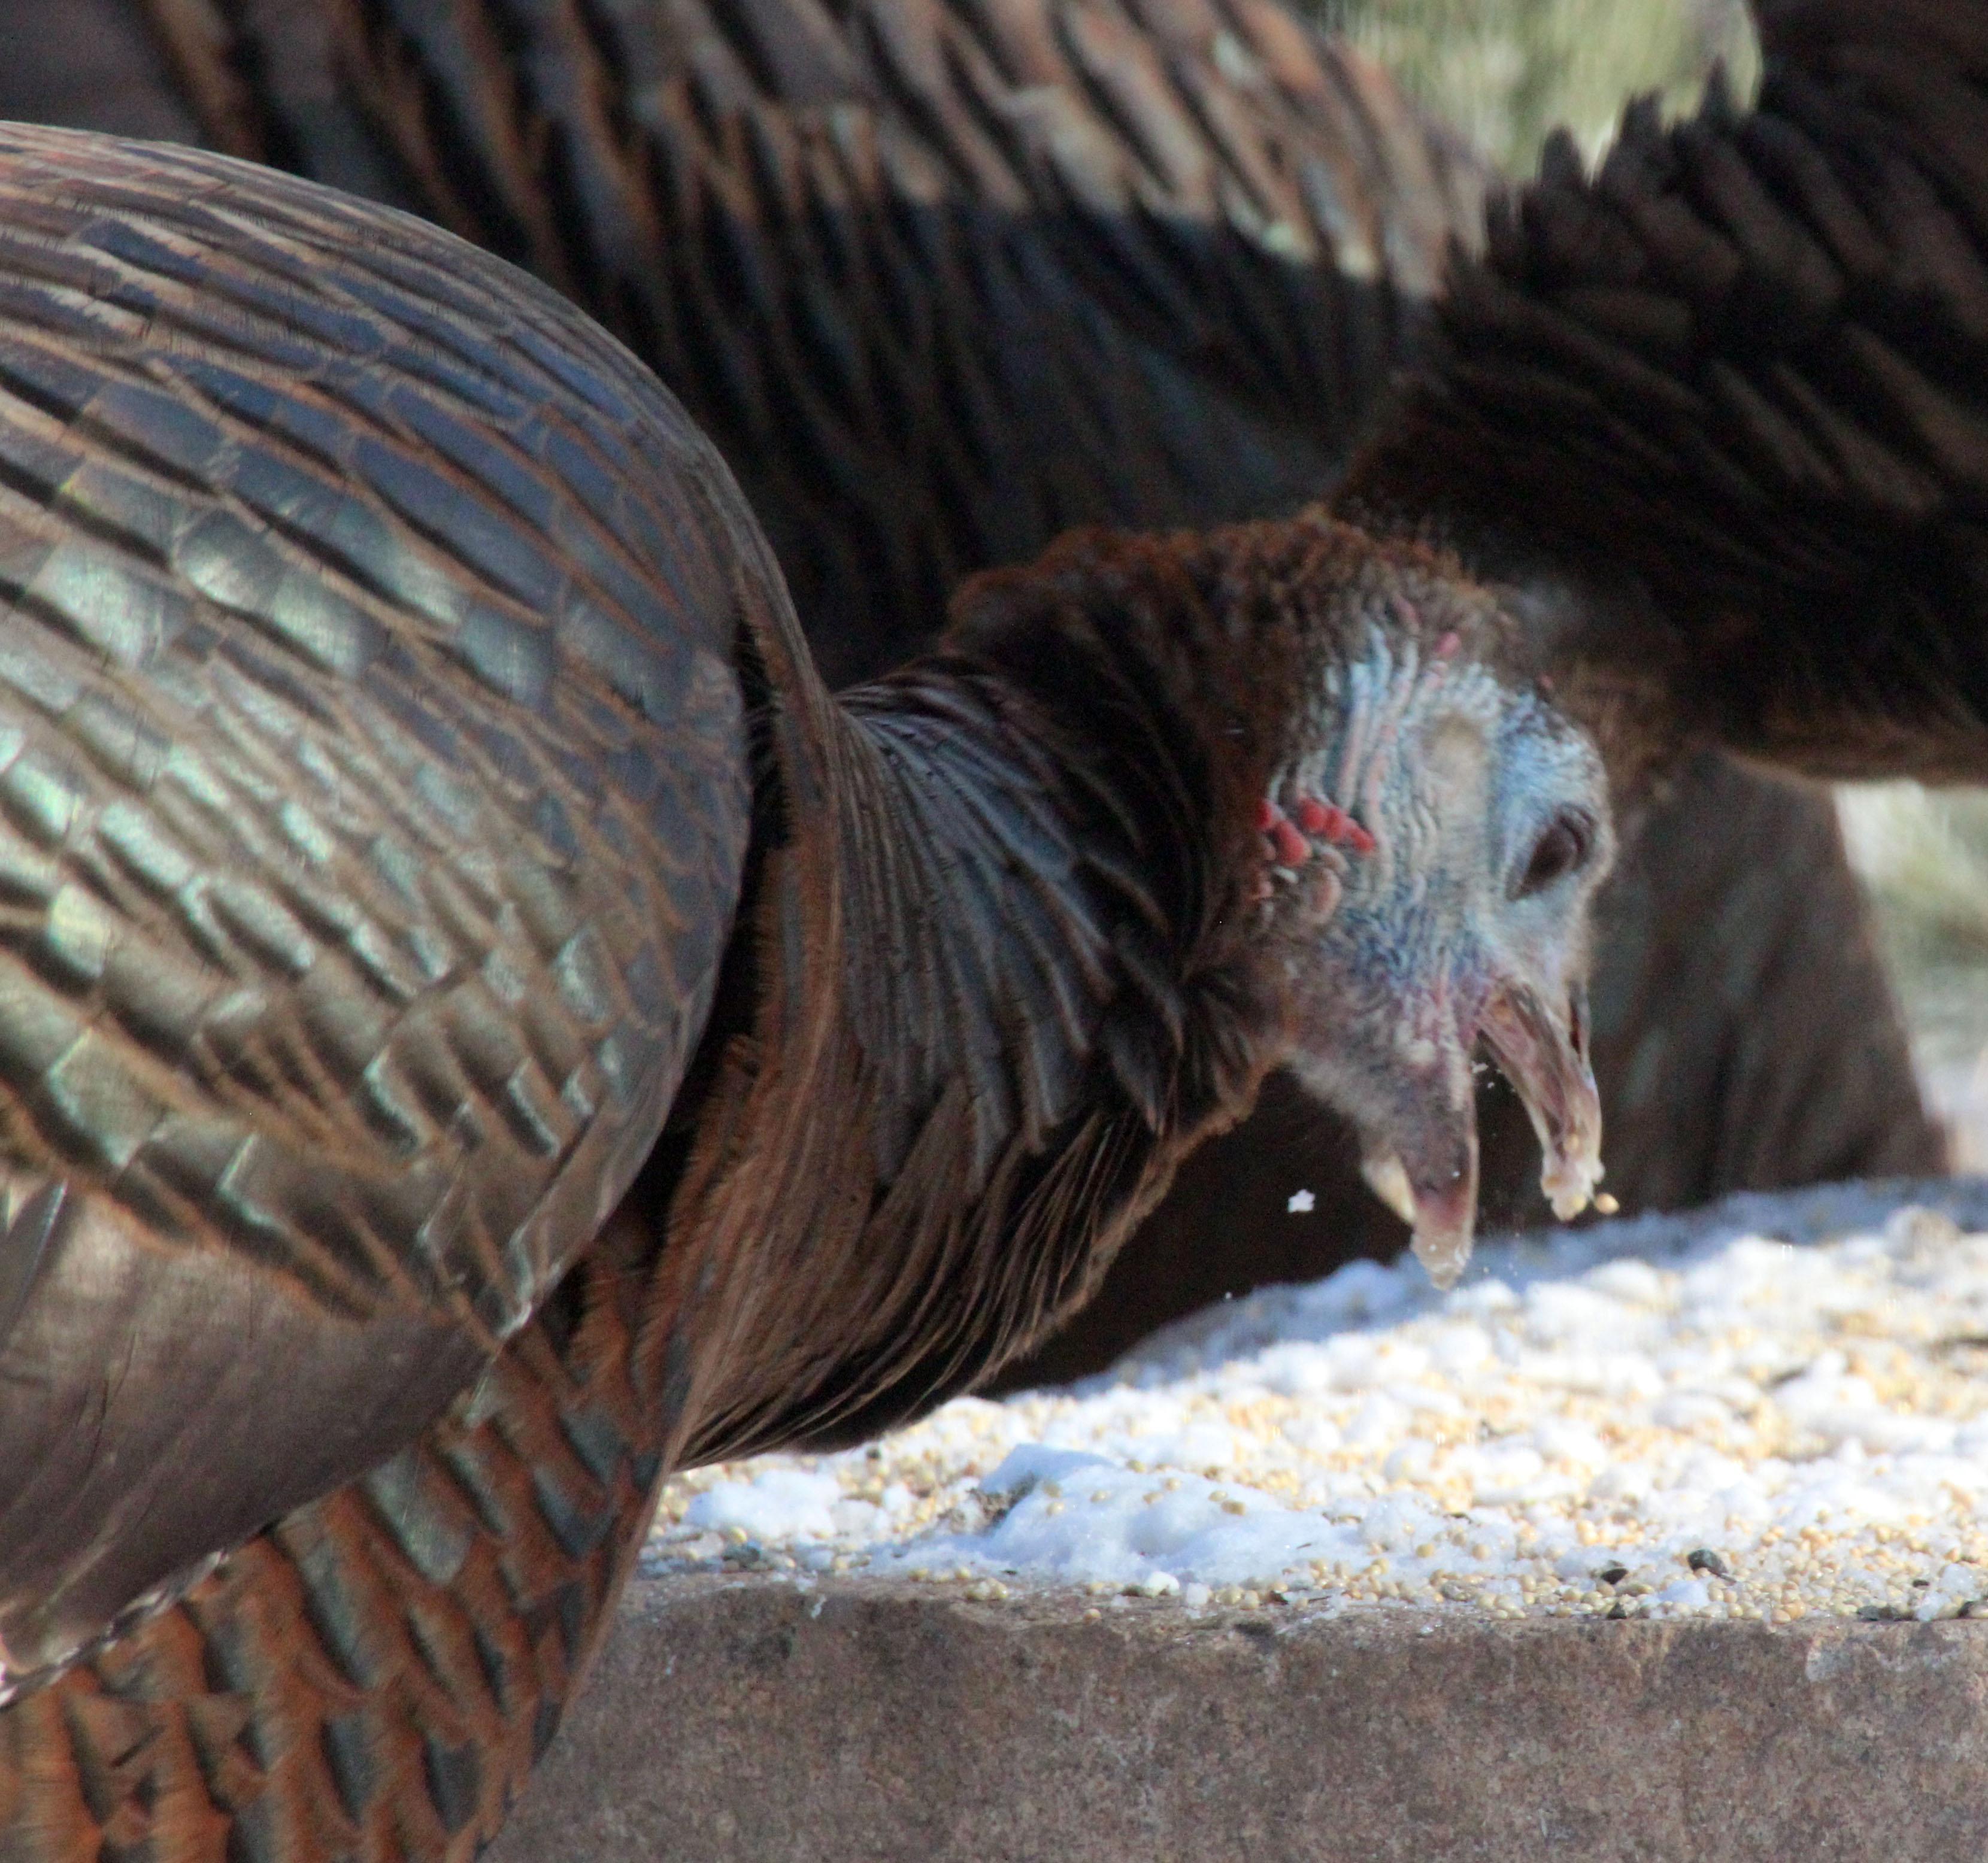 29ec88ca21 gobble-bird-seed-turkey. Turkey eating sunflower seed